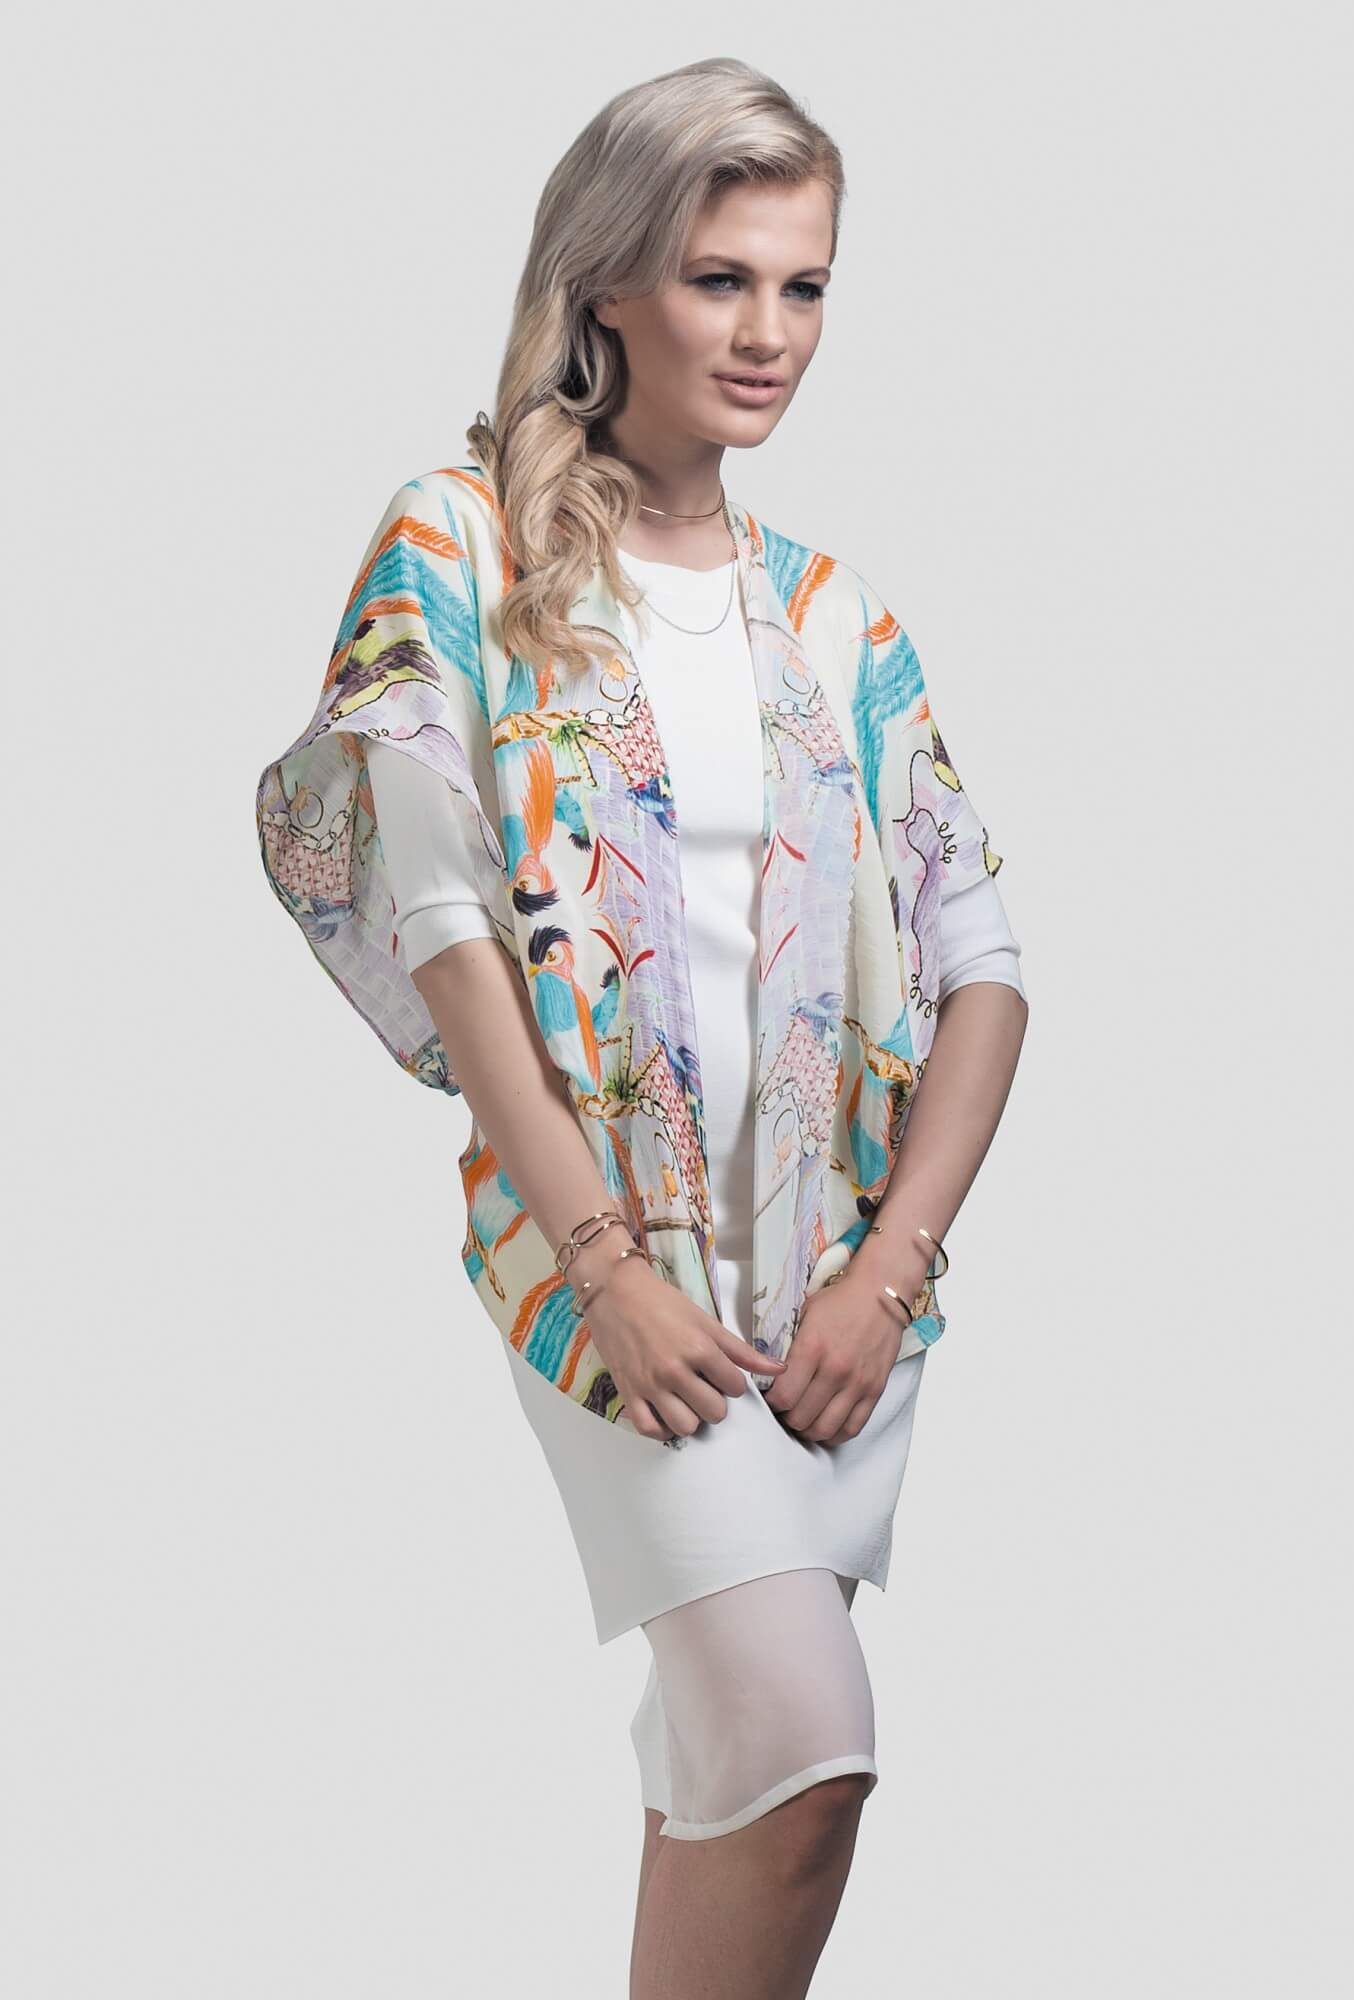 Orange Silk Kimono Parrot   Jenny Collicott